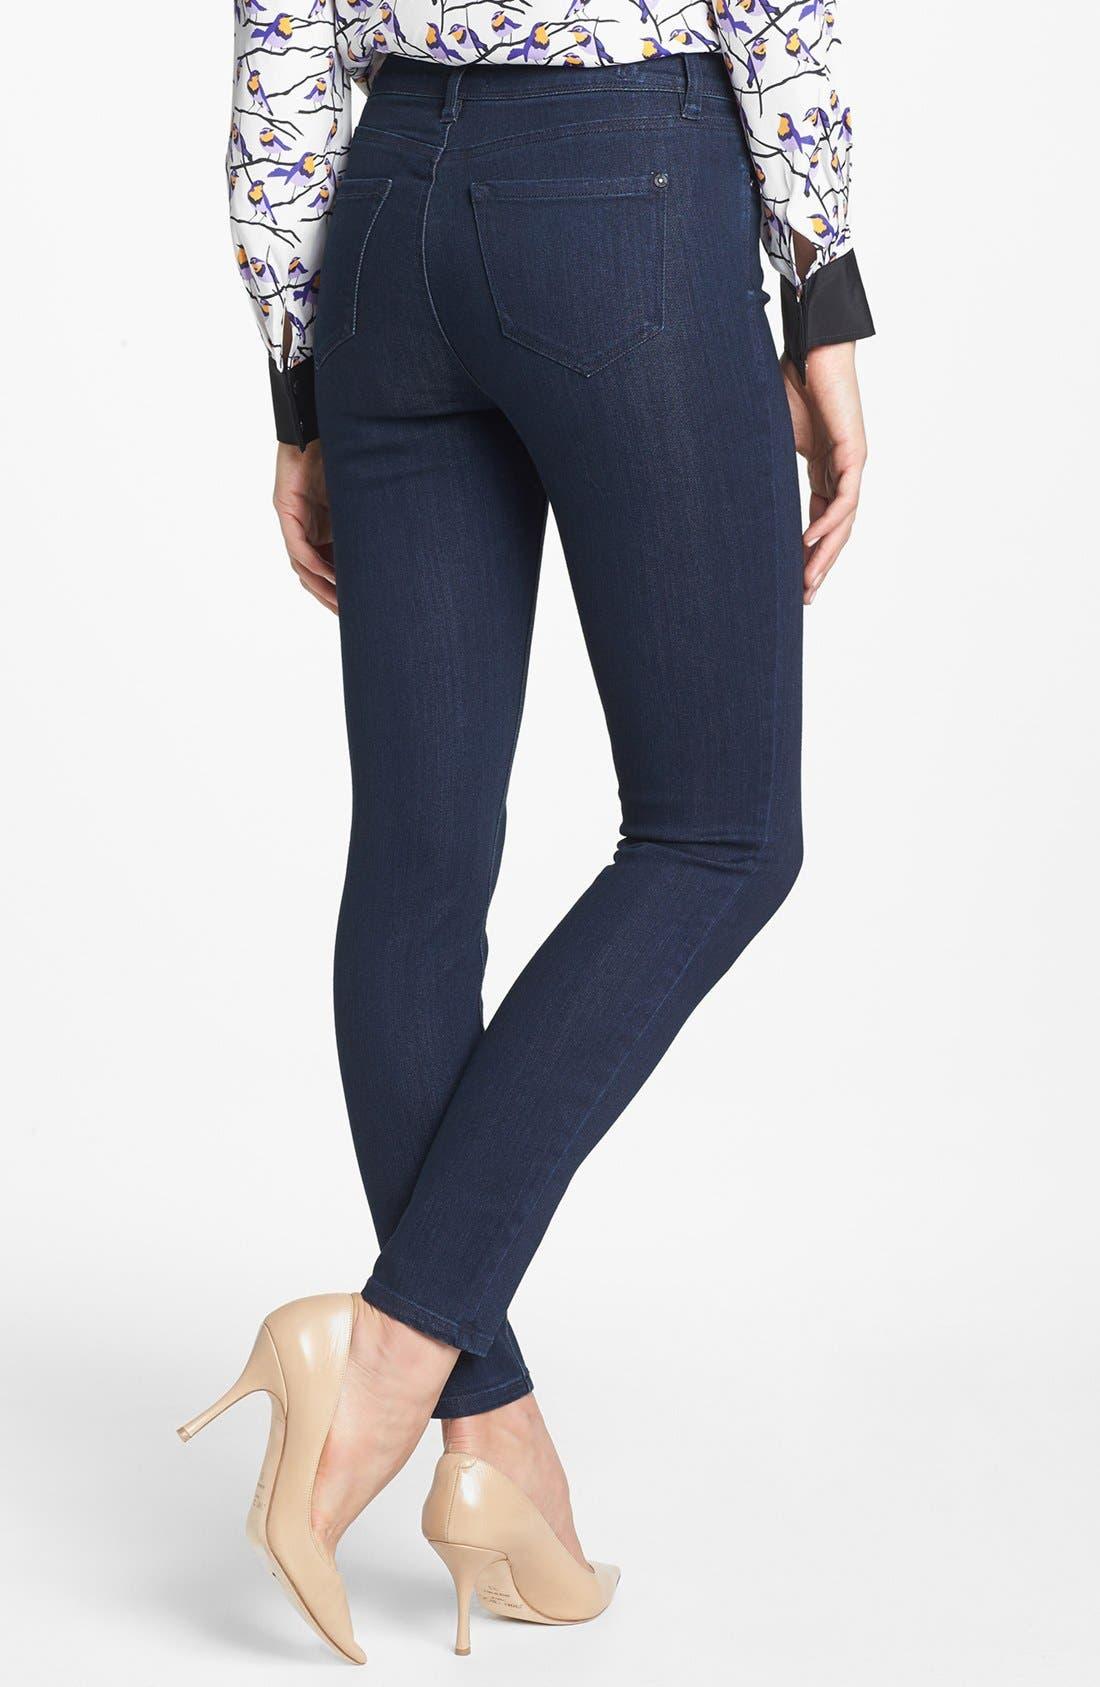 KENSIE,                             'Ankle Biter' High Rise Skinny Jeans,                             Alternate thumbnail 2, color,                             427